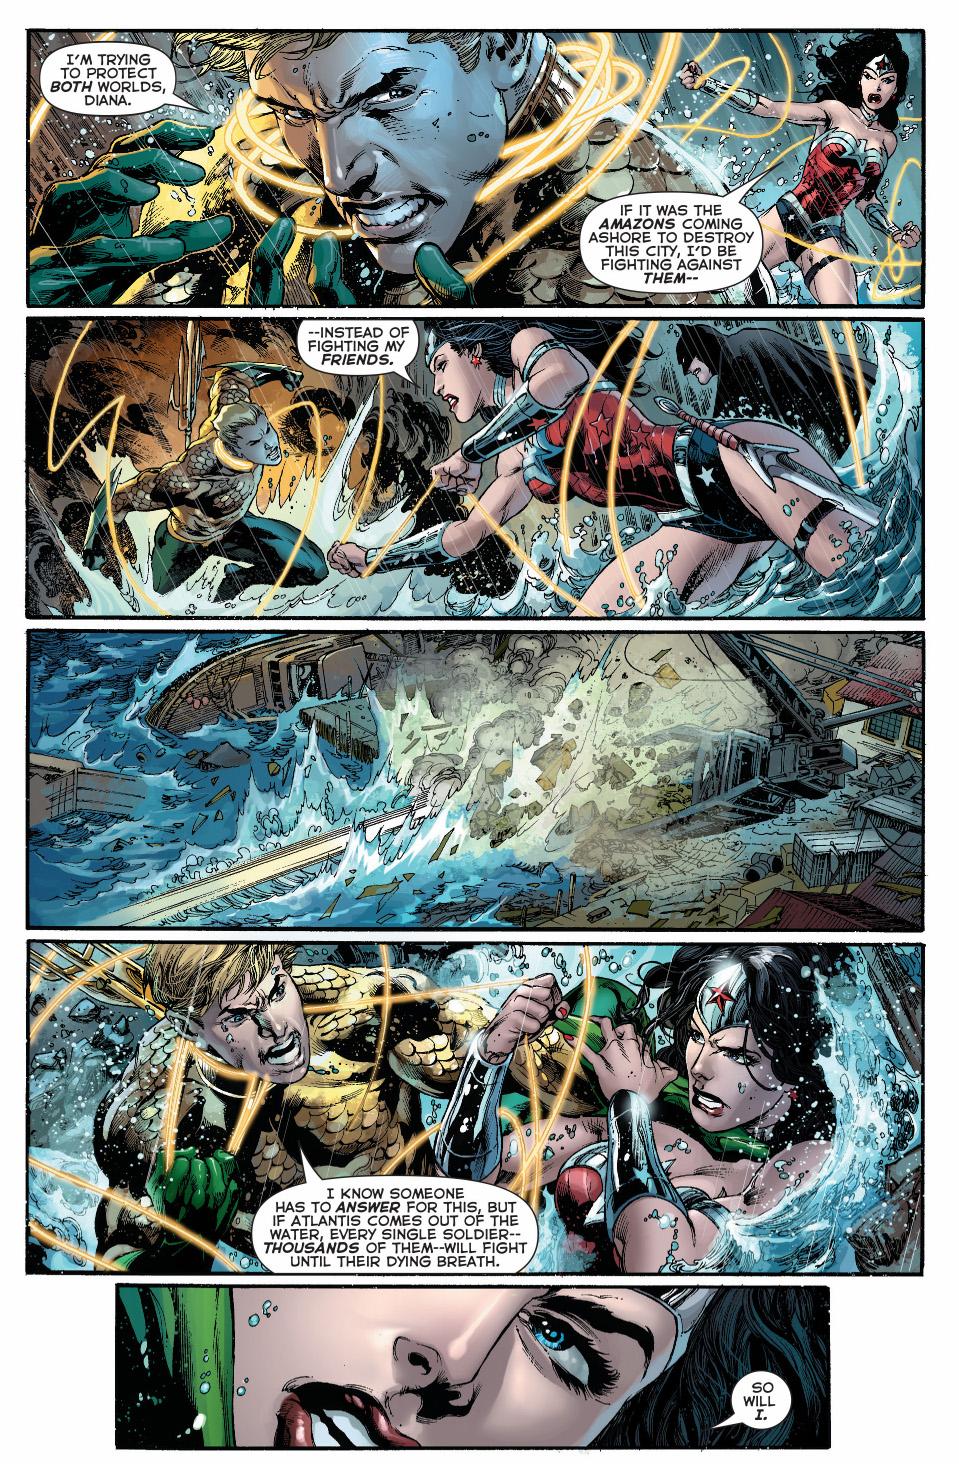 Wonder woman beaten justice league